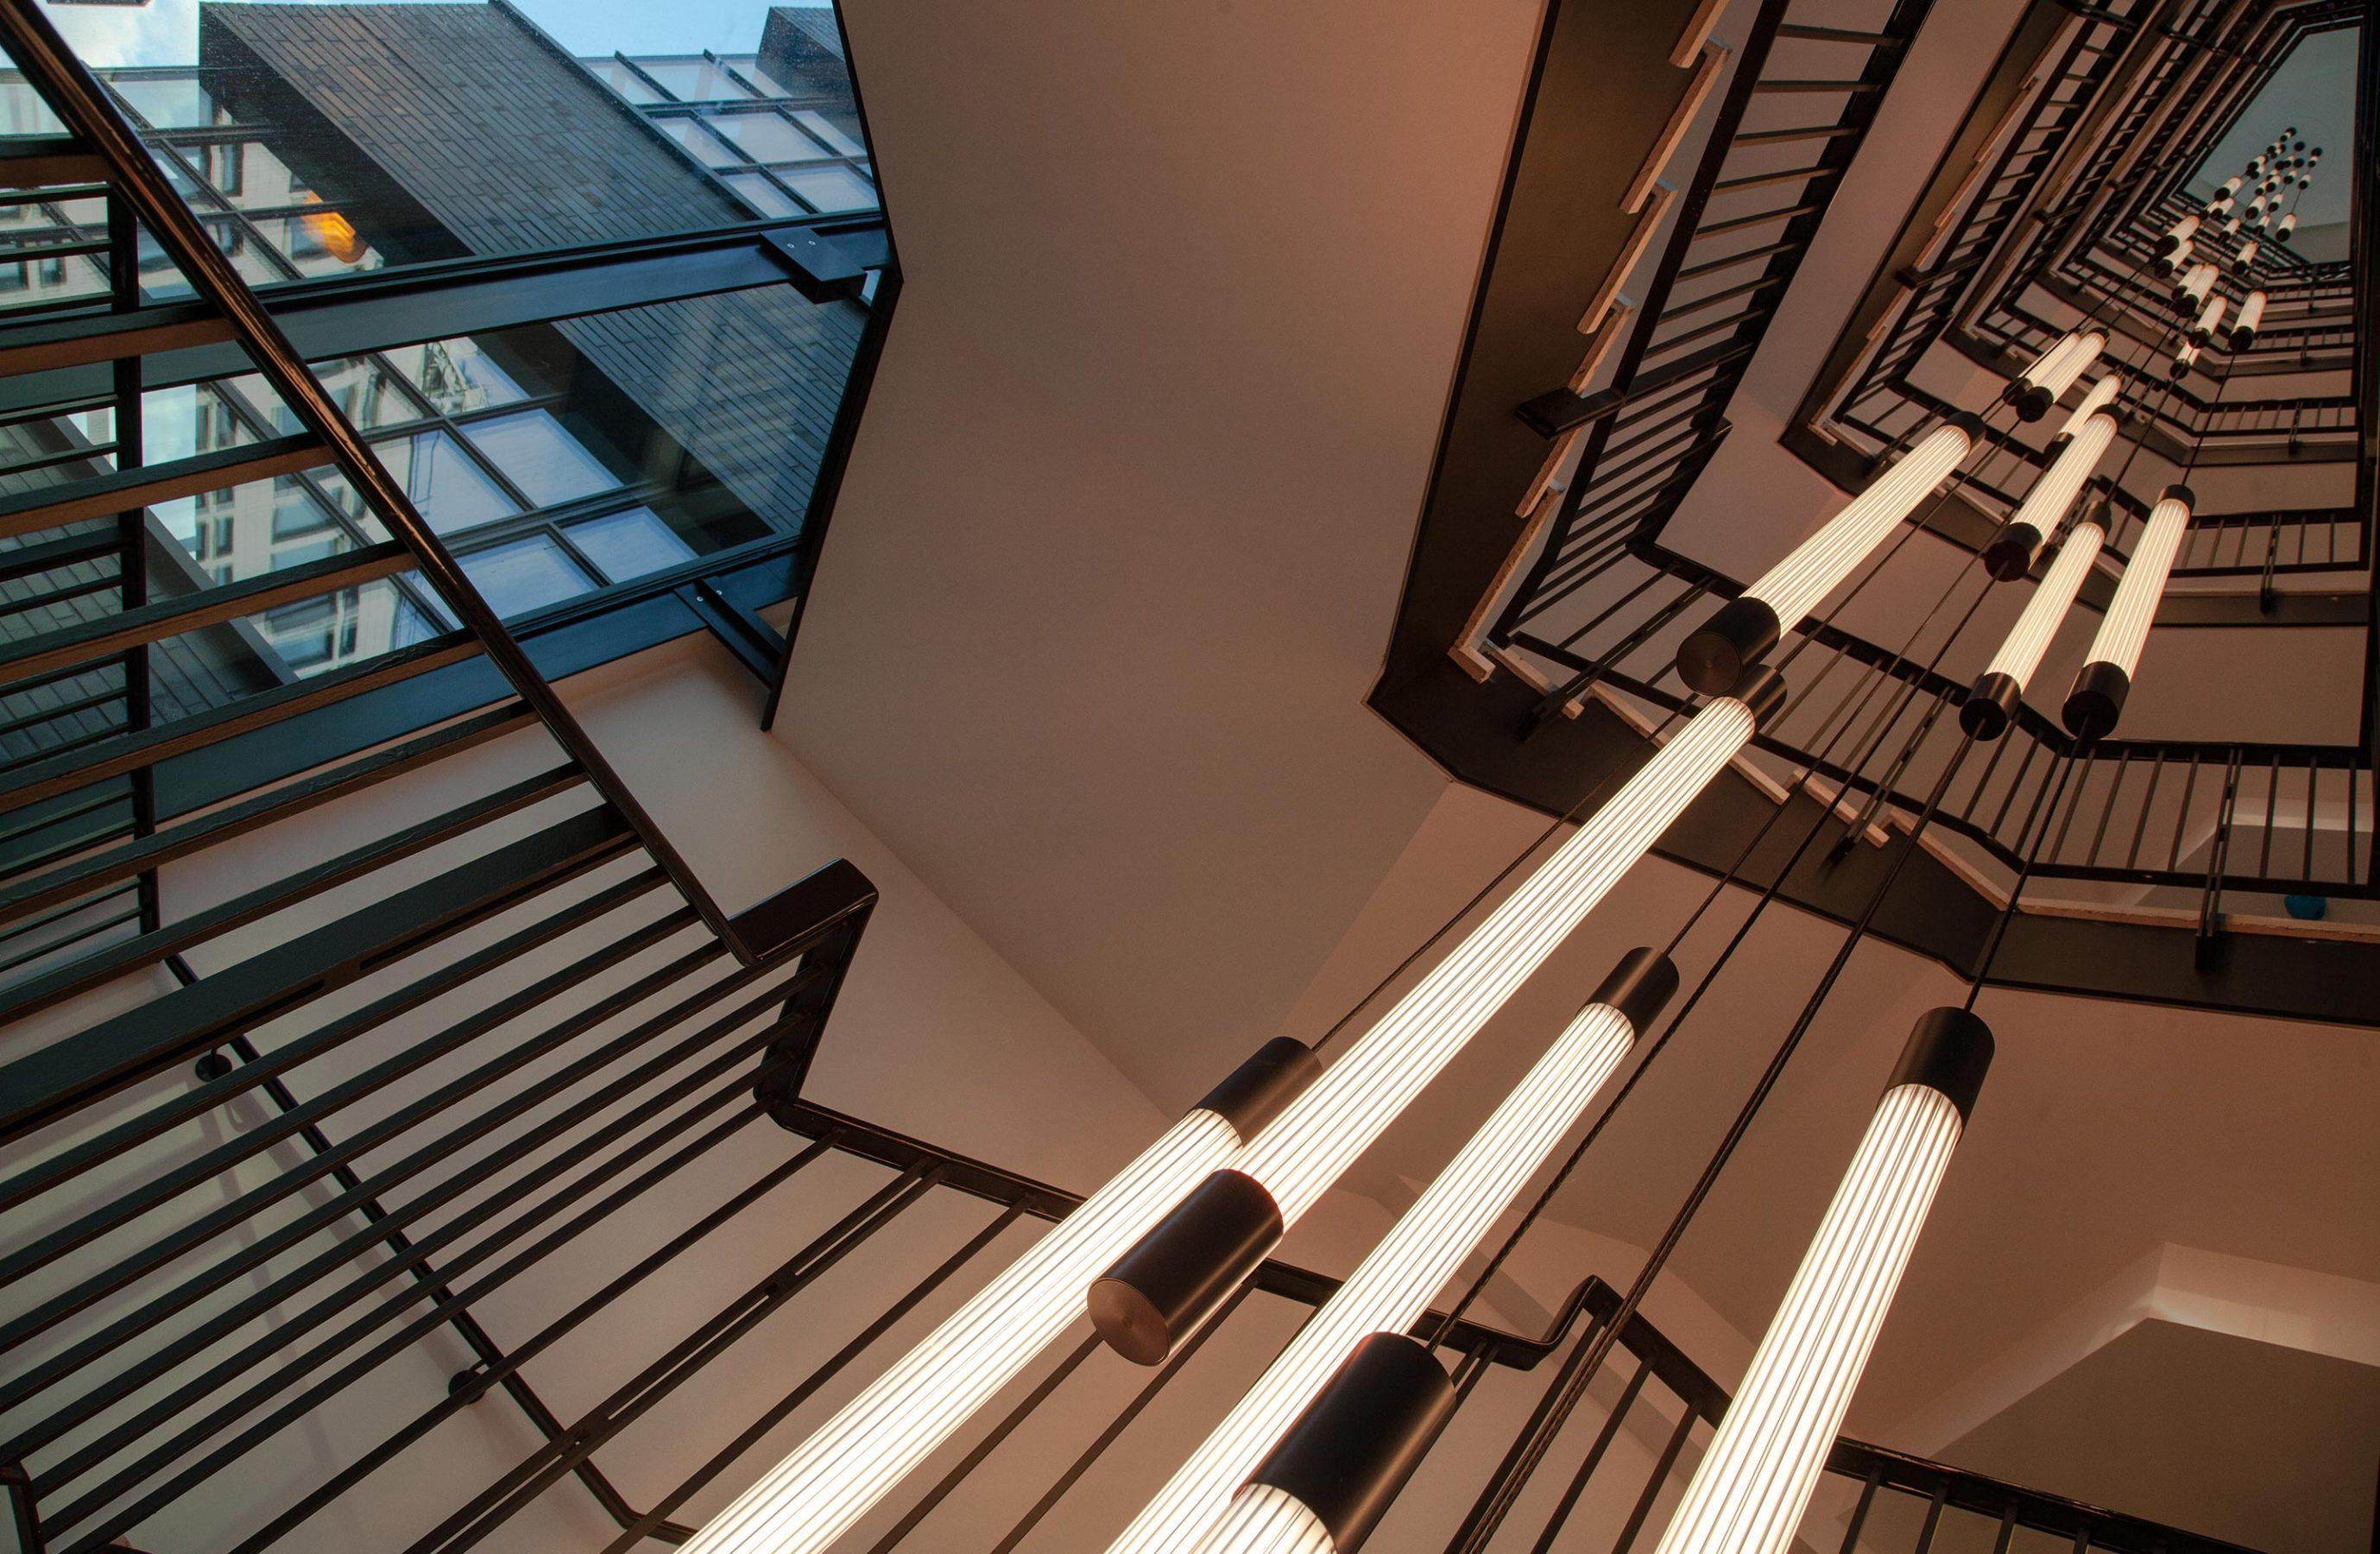 09-Bauhaus-haberdashery-w-slideshow